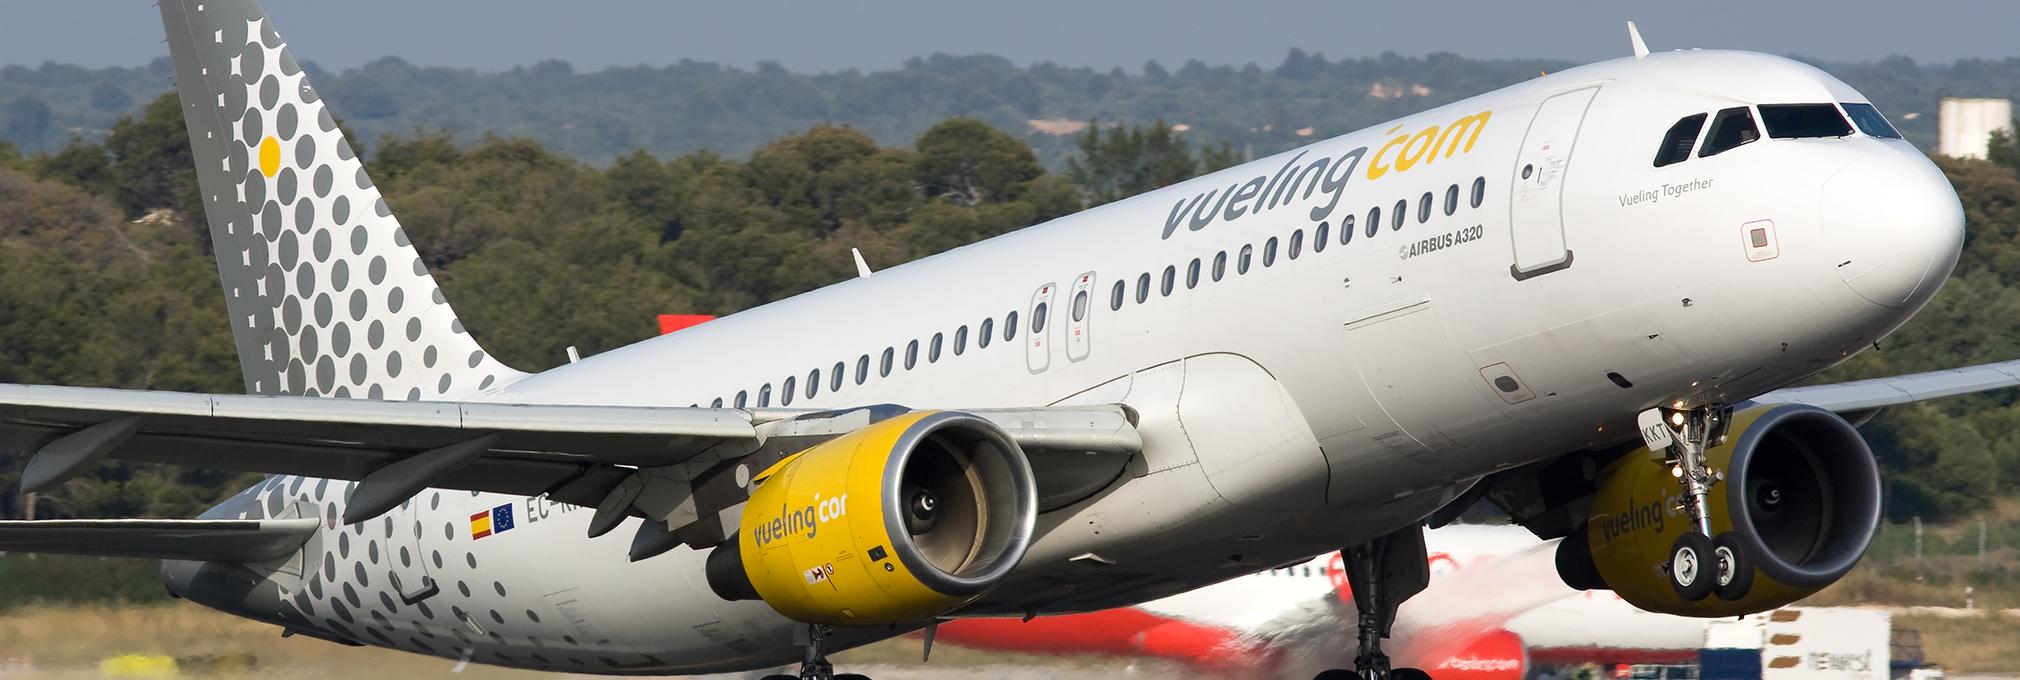 Vueling Airlines Absturz